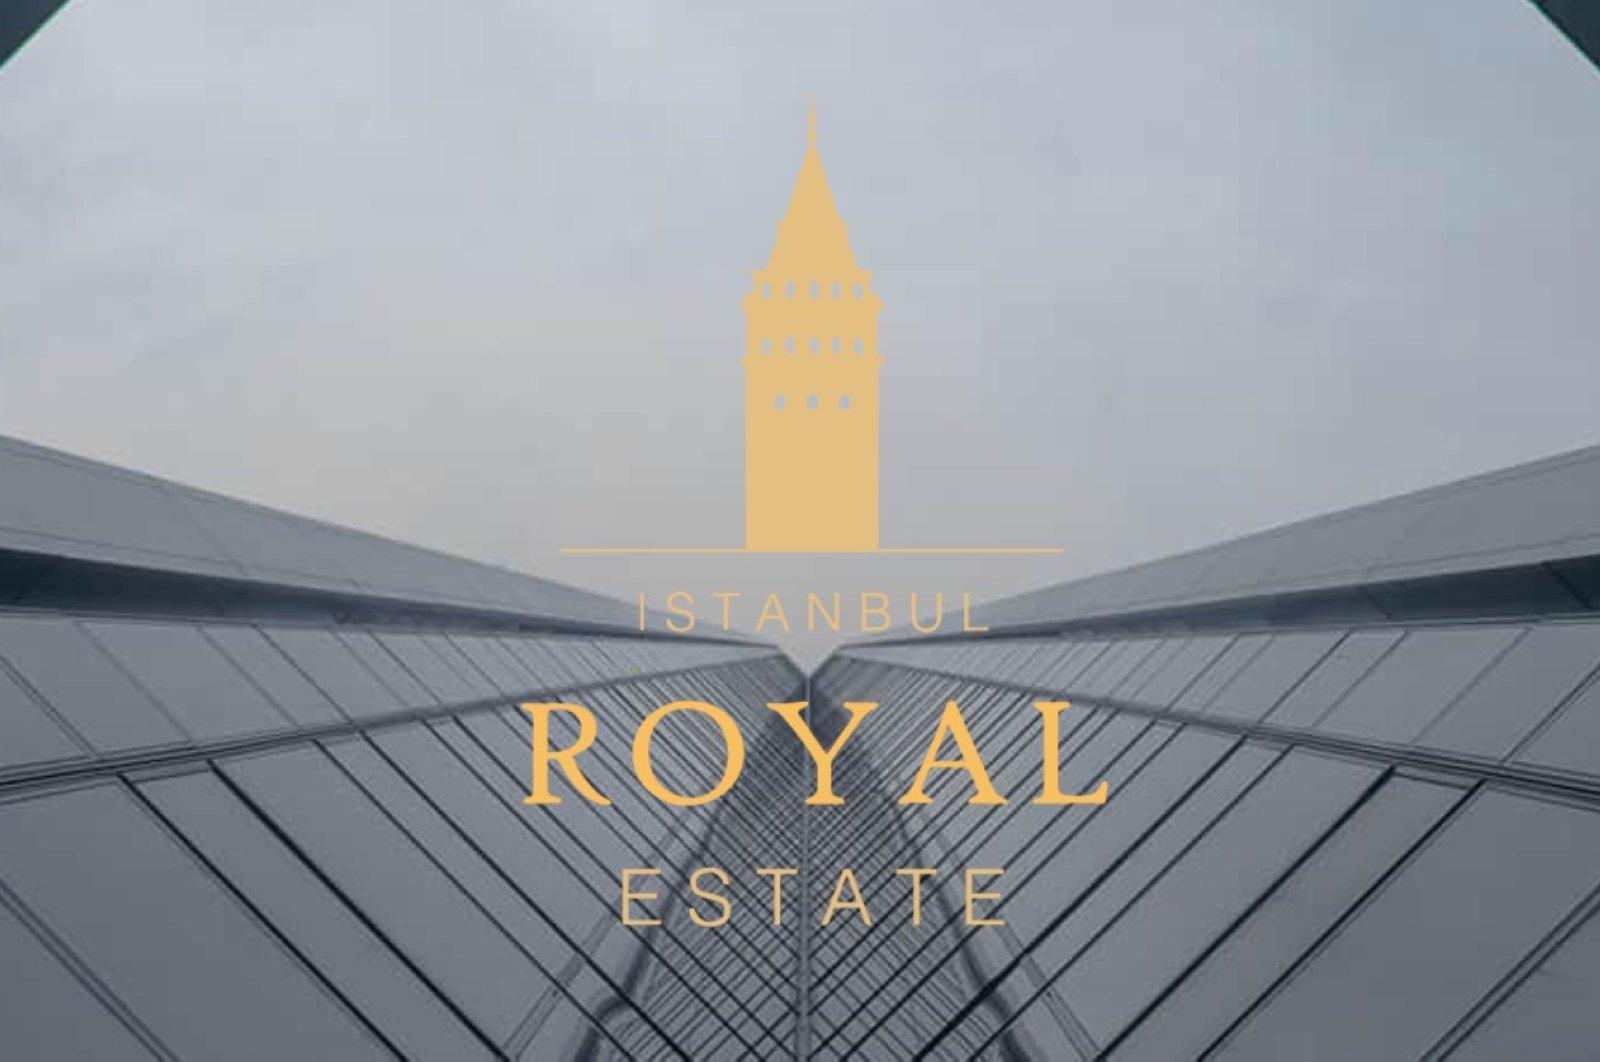 Istanbul Royal Estate